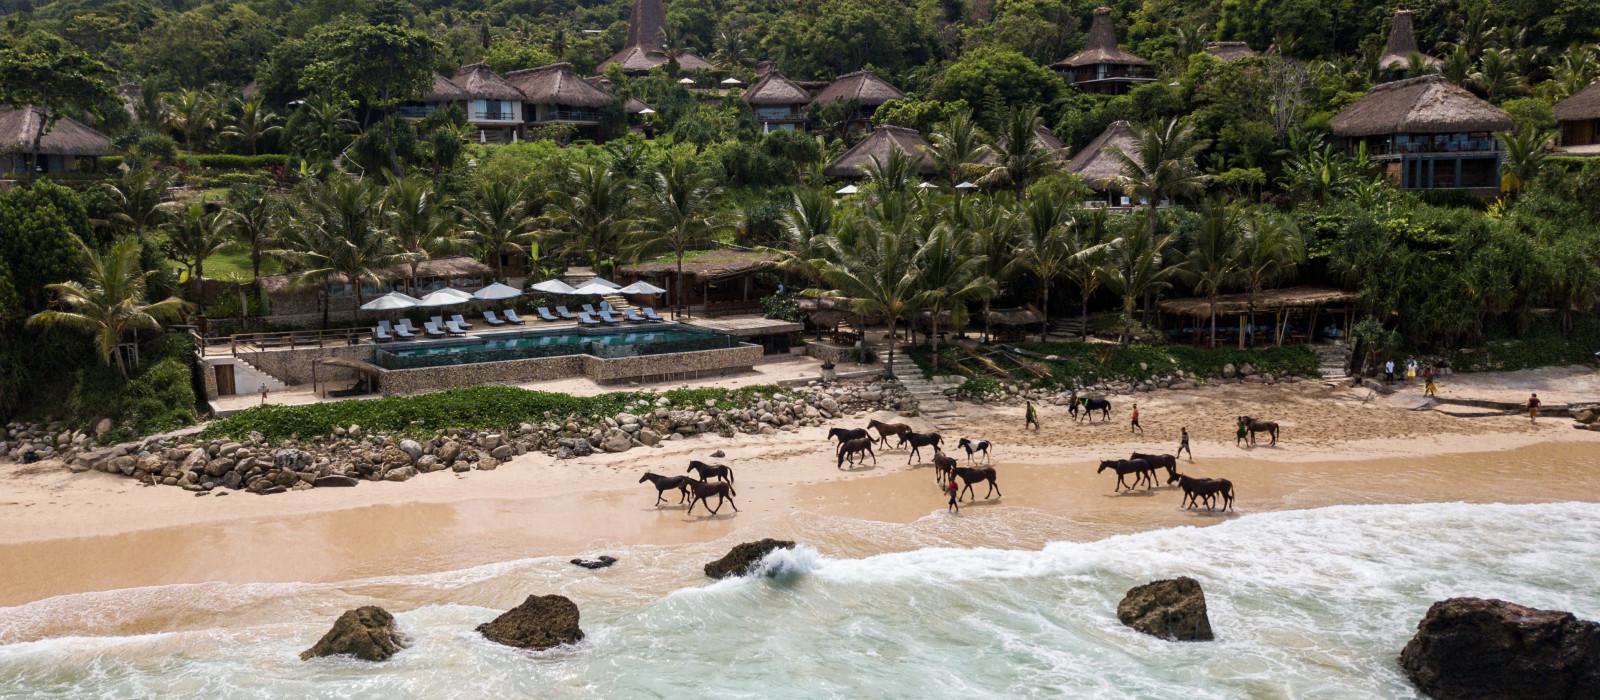 Reiseziel Sumba, Nihi Strand Indonesien